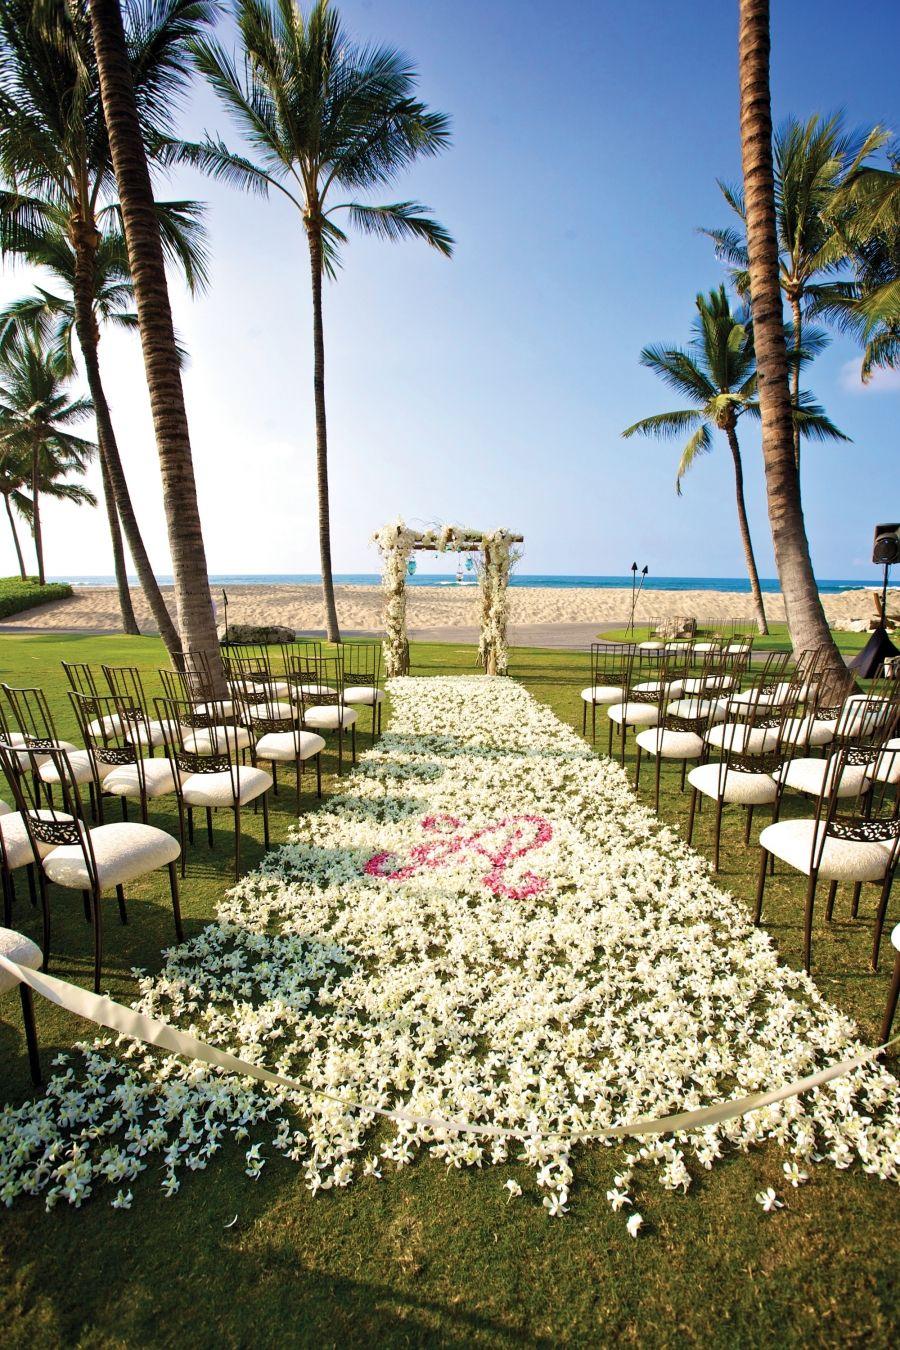 Nau Kou Aloha: My Love is Yours | Hualala\'i, Hawaii Wedding © Pacific Weddings